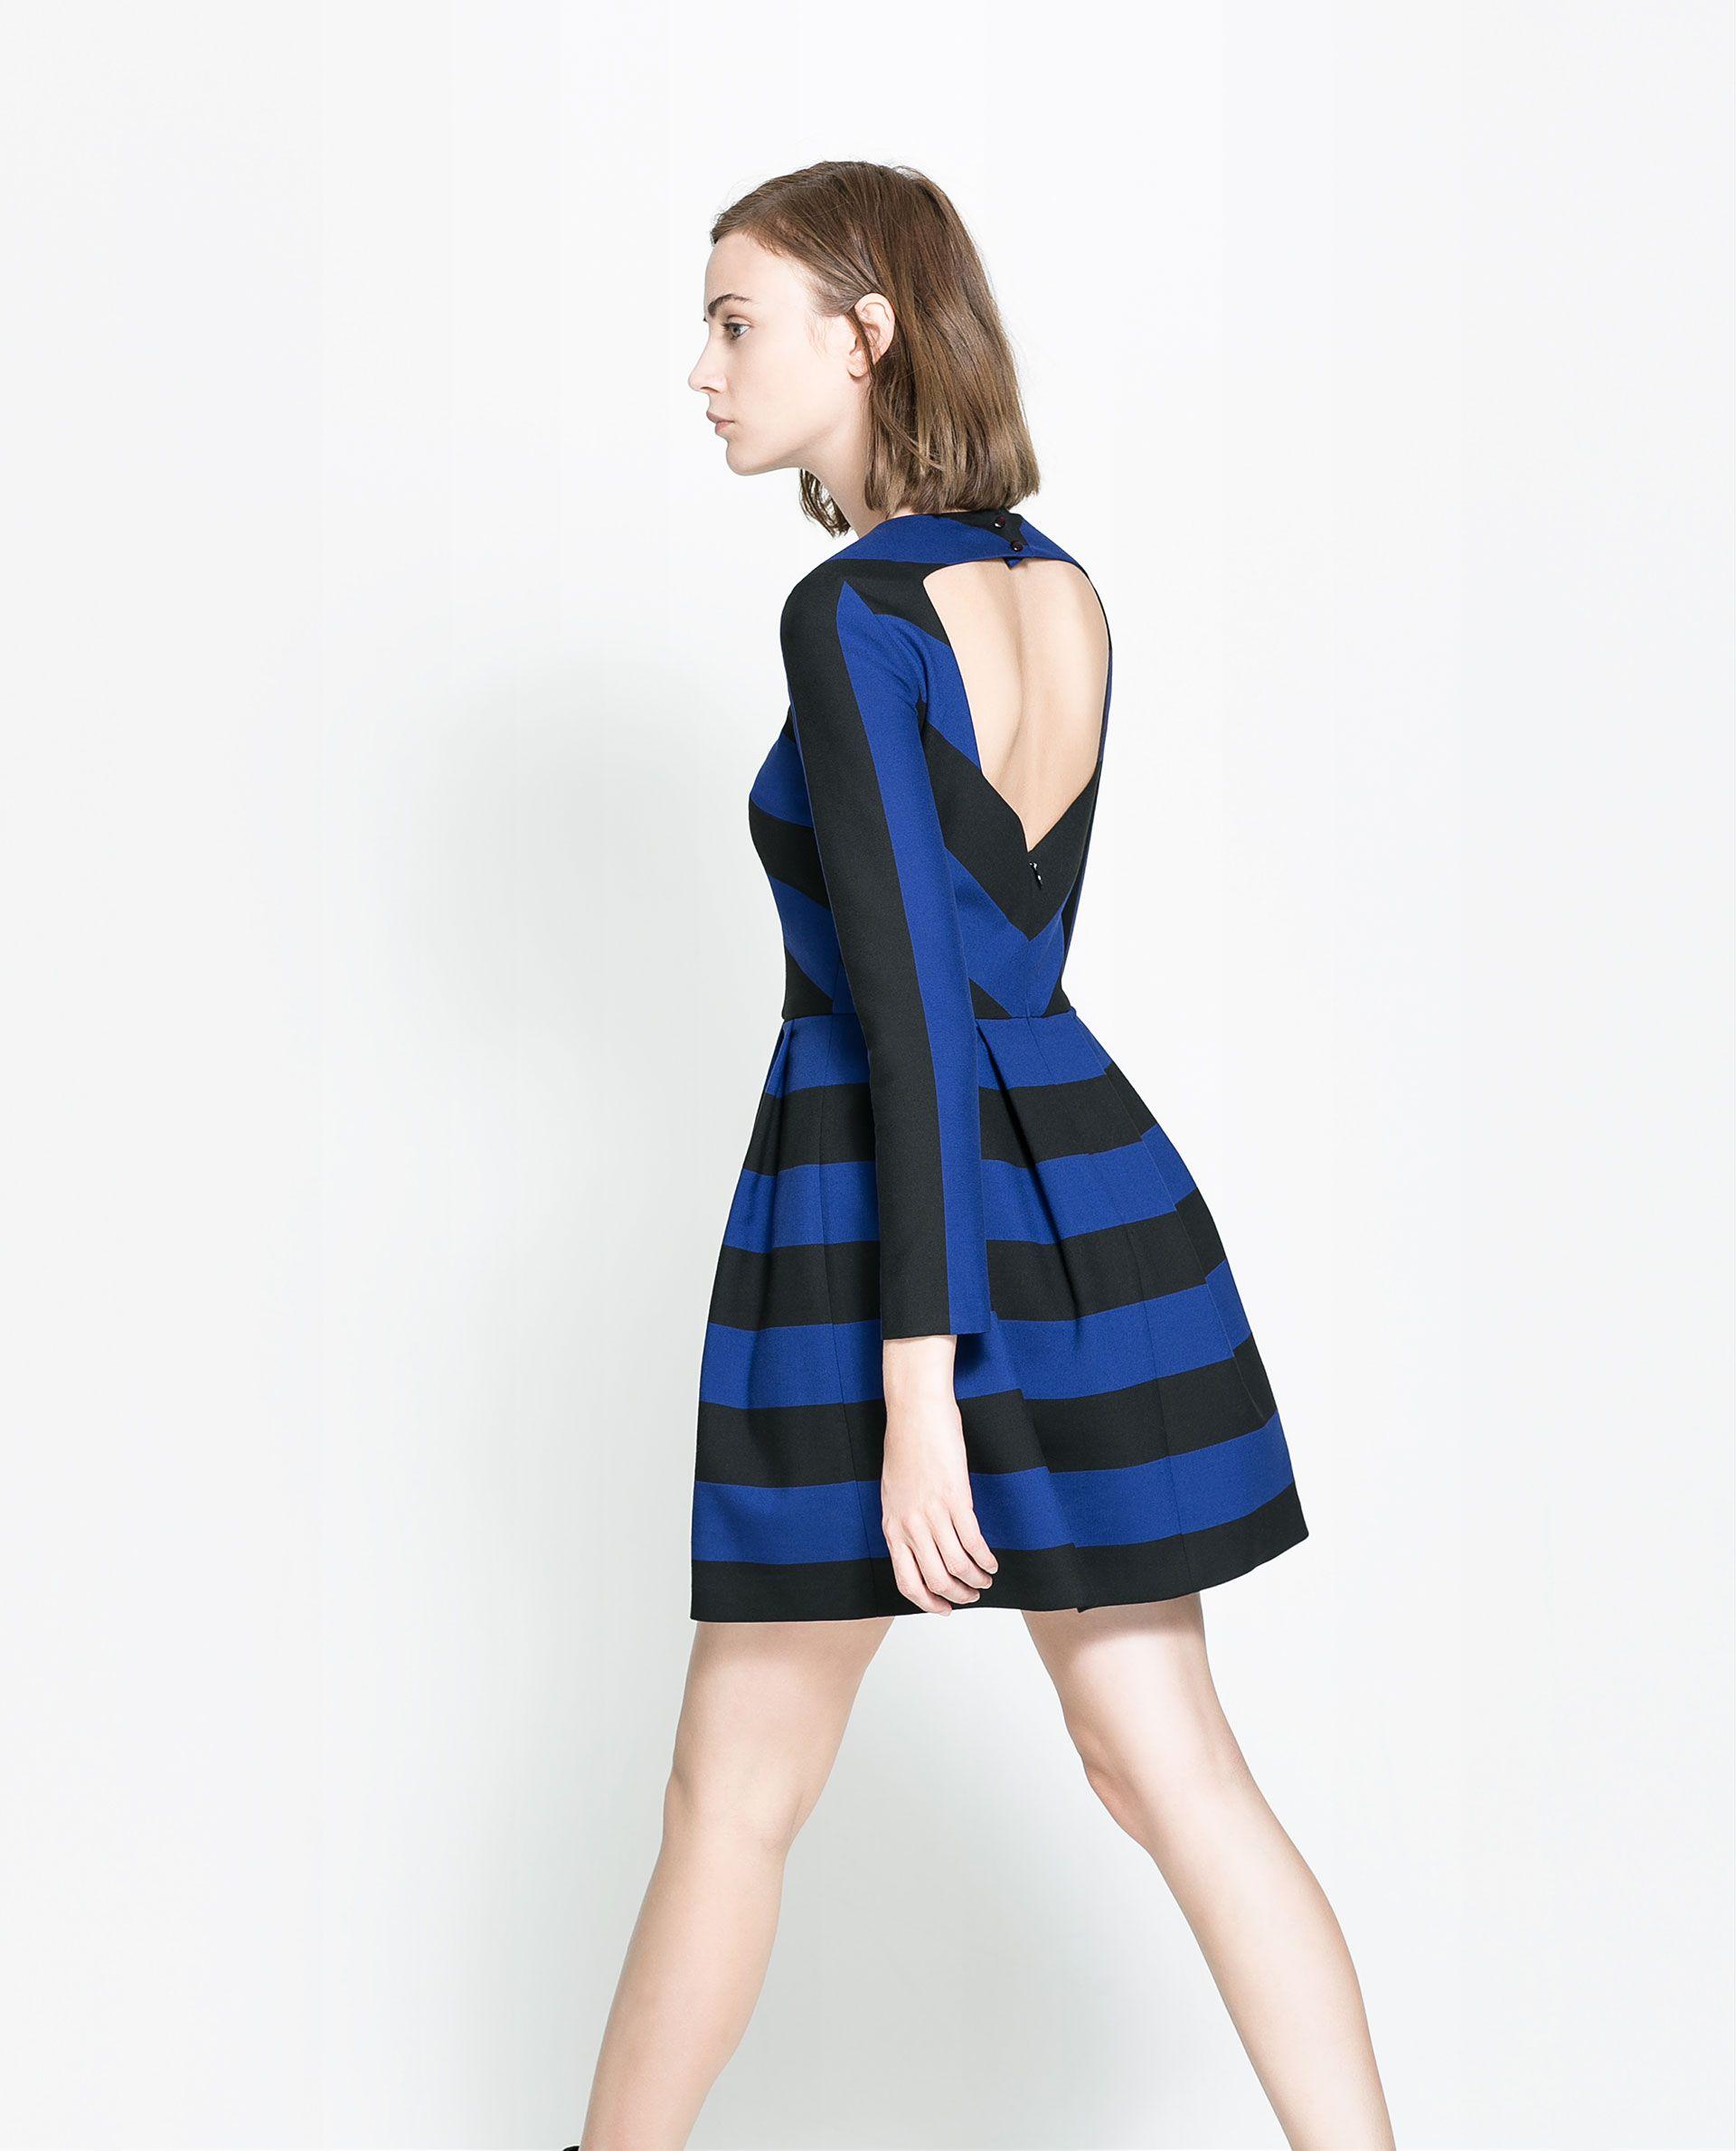 OPEN - BACK DRESS - Dresses - TRF | ZARA Serbia | zara. | Pinterest